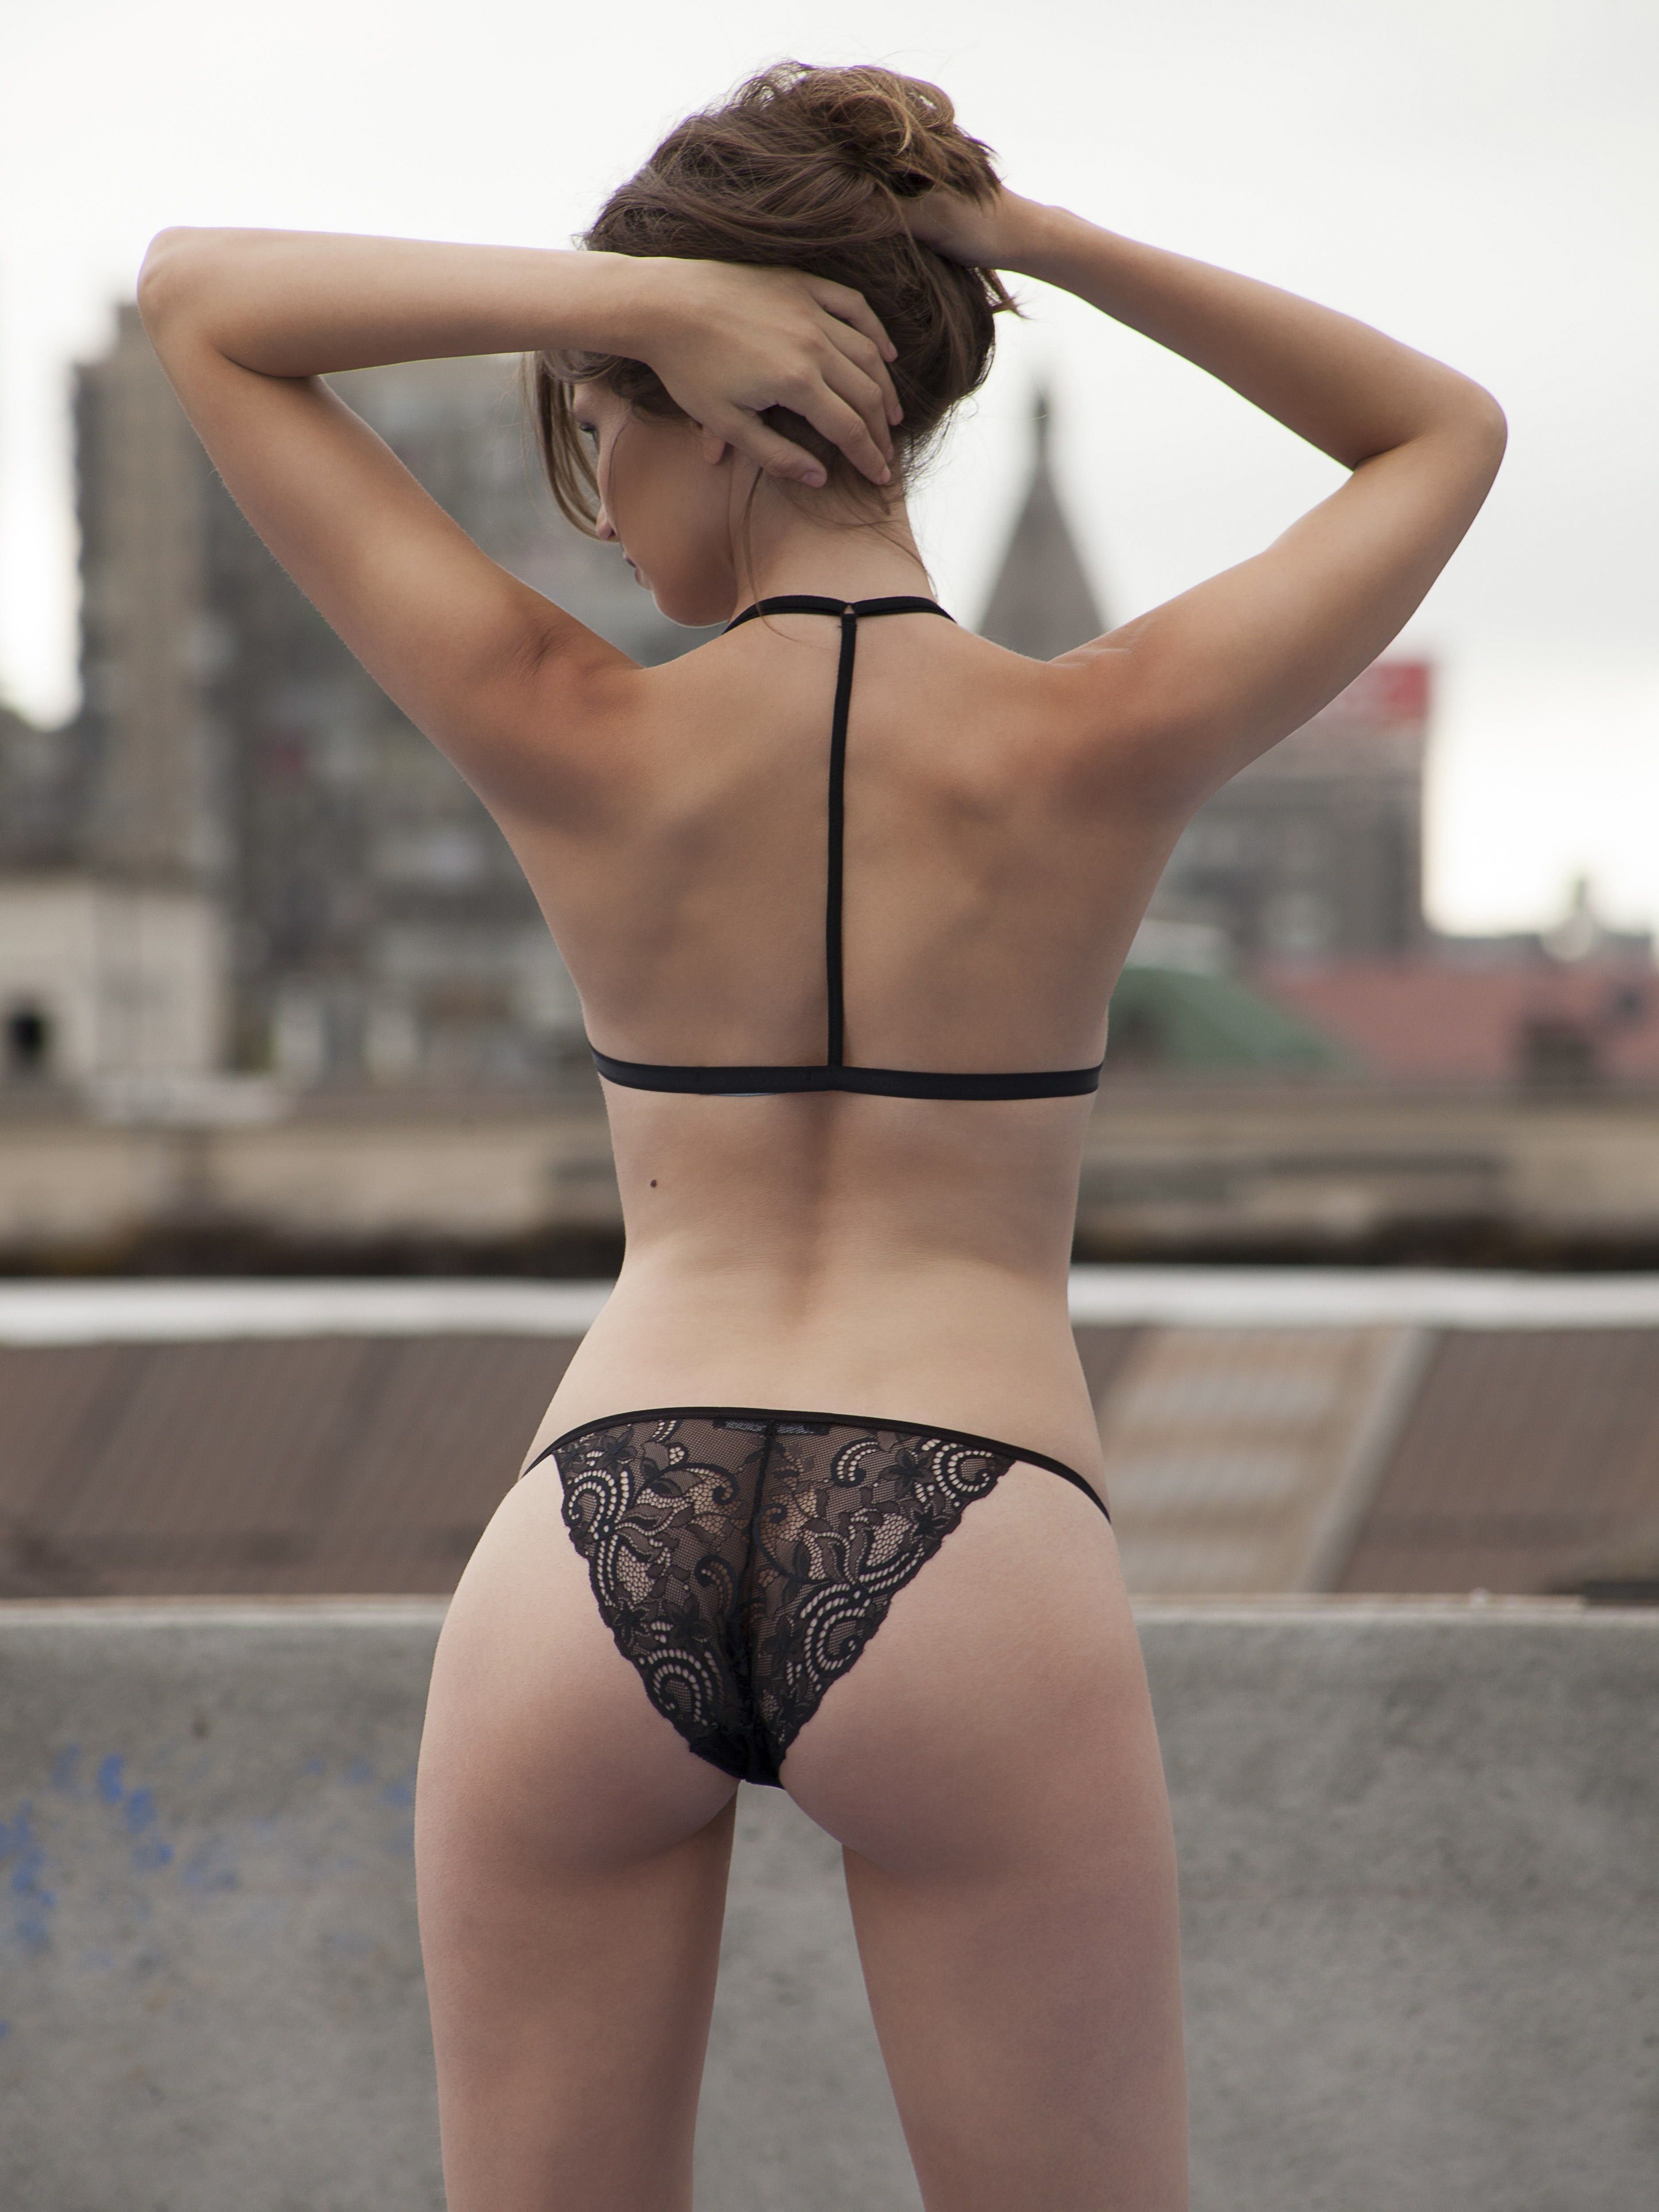 NegroLencería Tanga Chilena Encaje De Mini BikinisSwimwear bf7gY6y